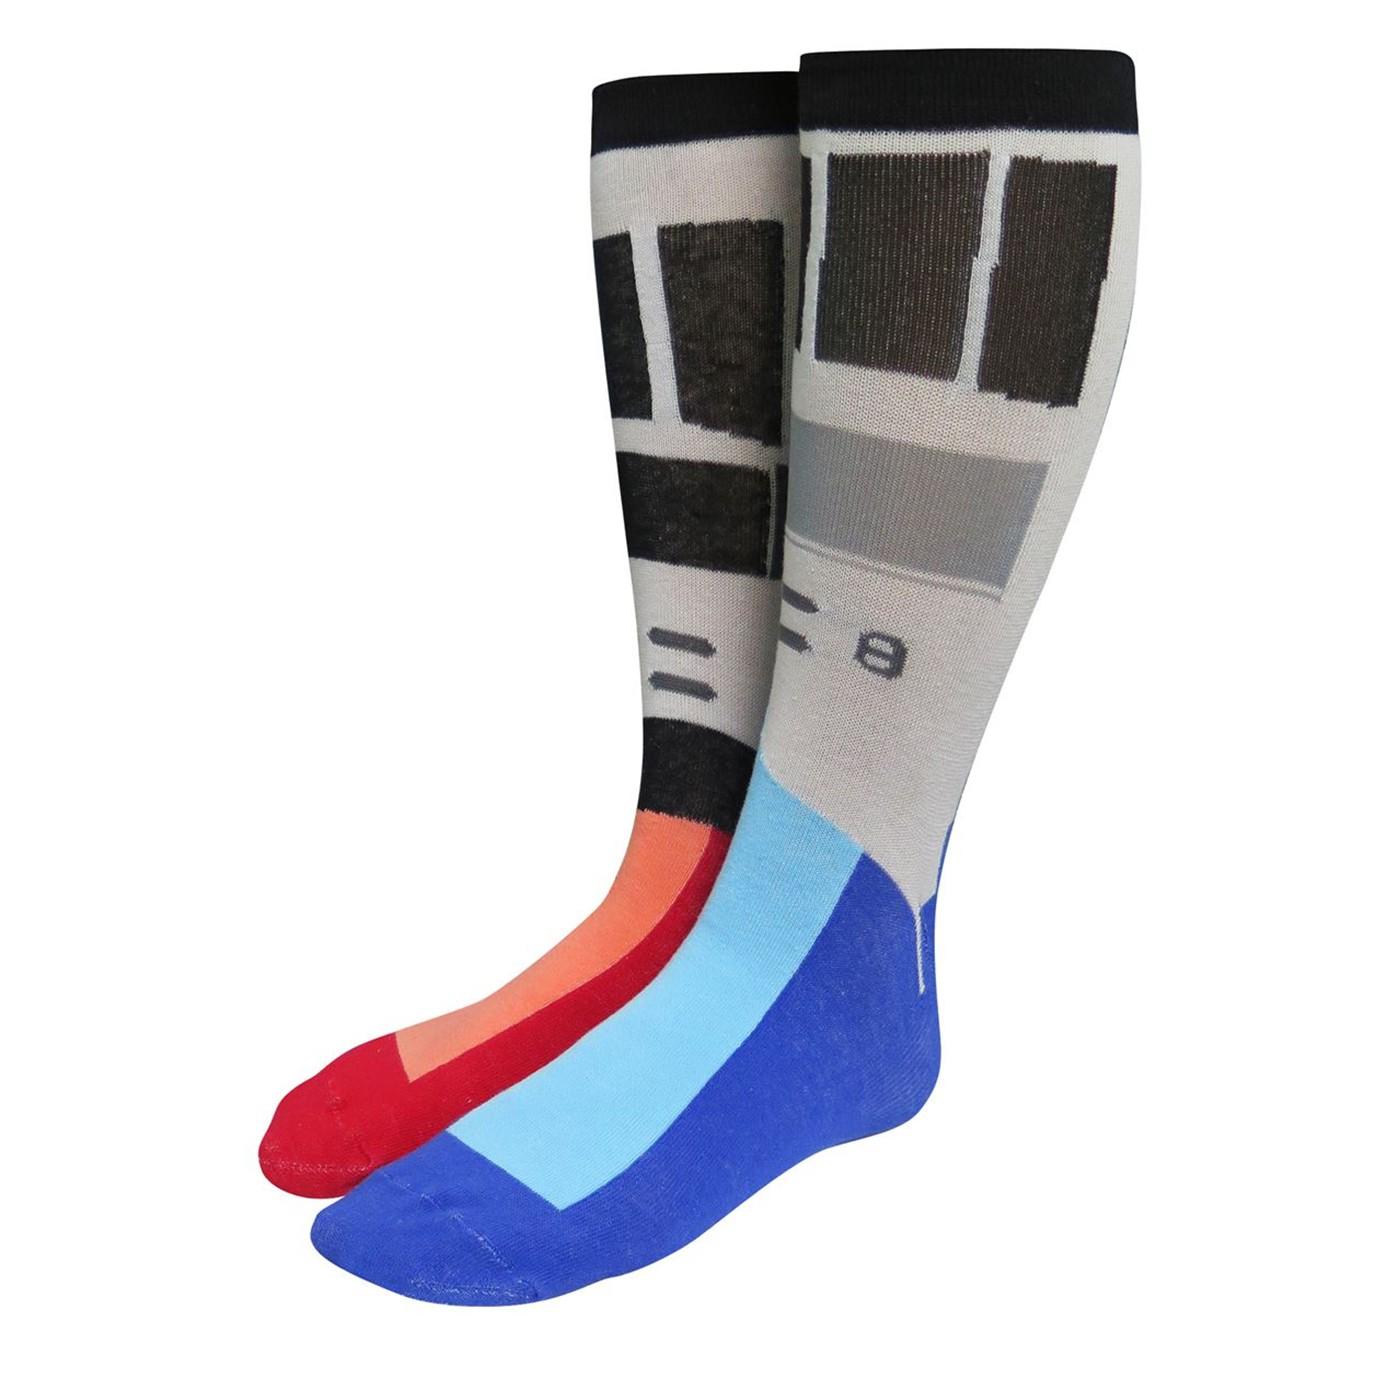 Star Wars Lightsabers Crew Socks